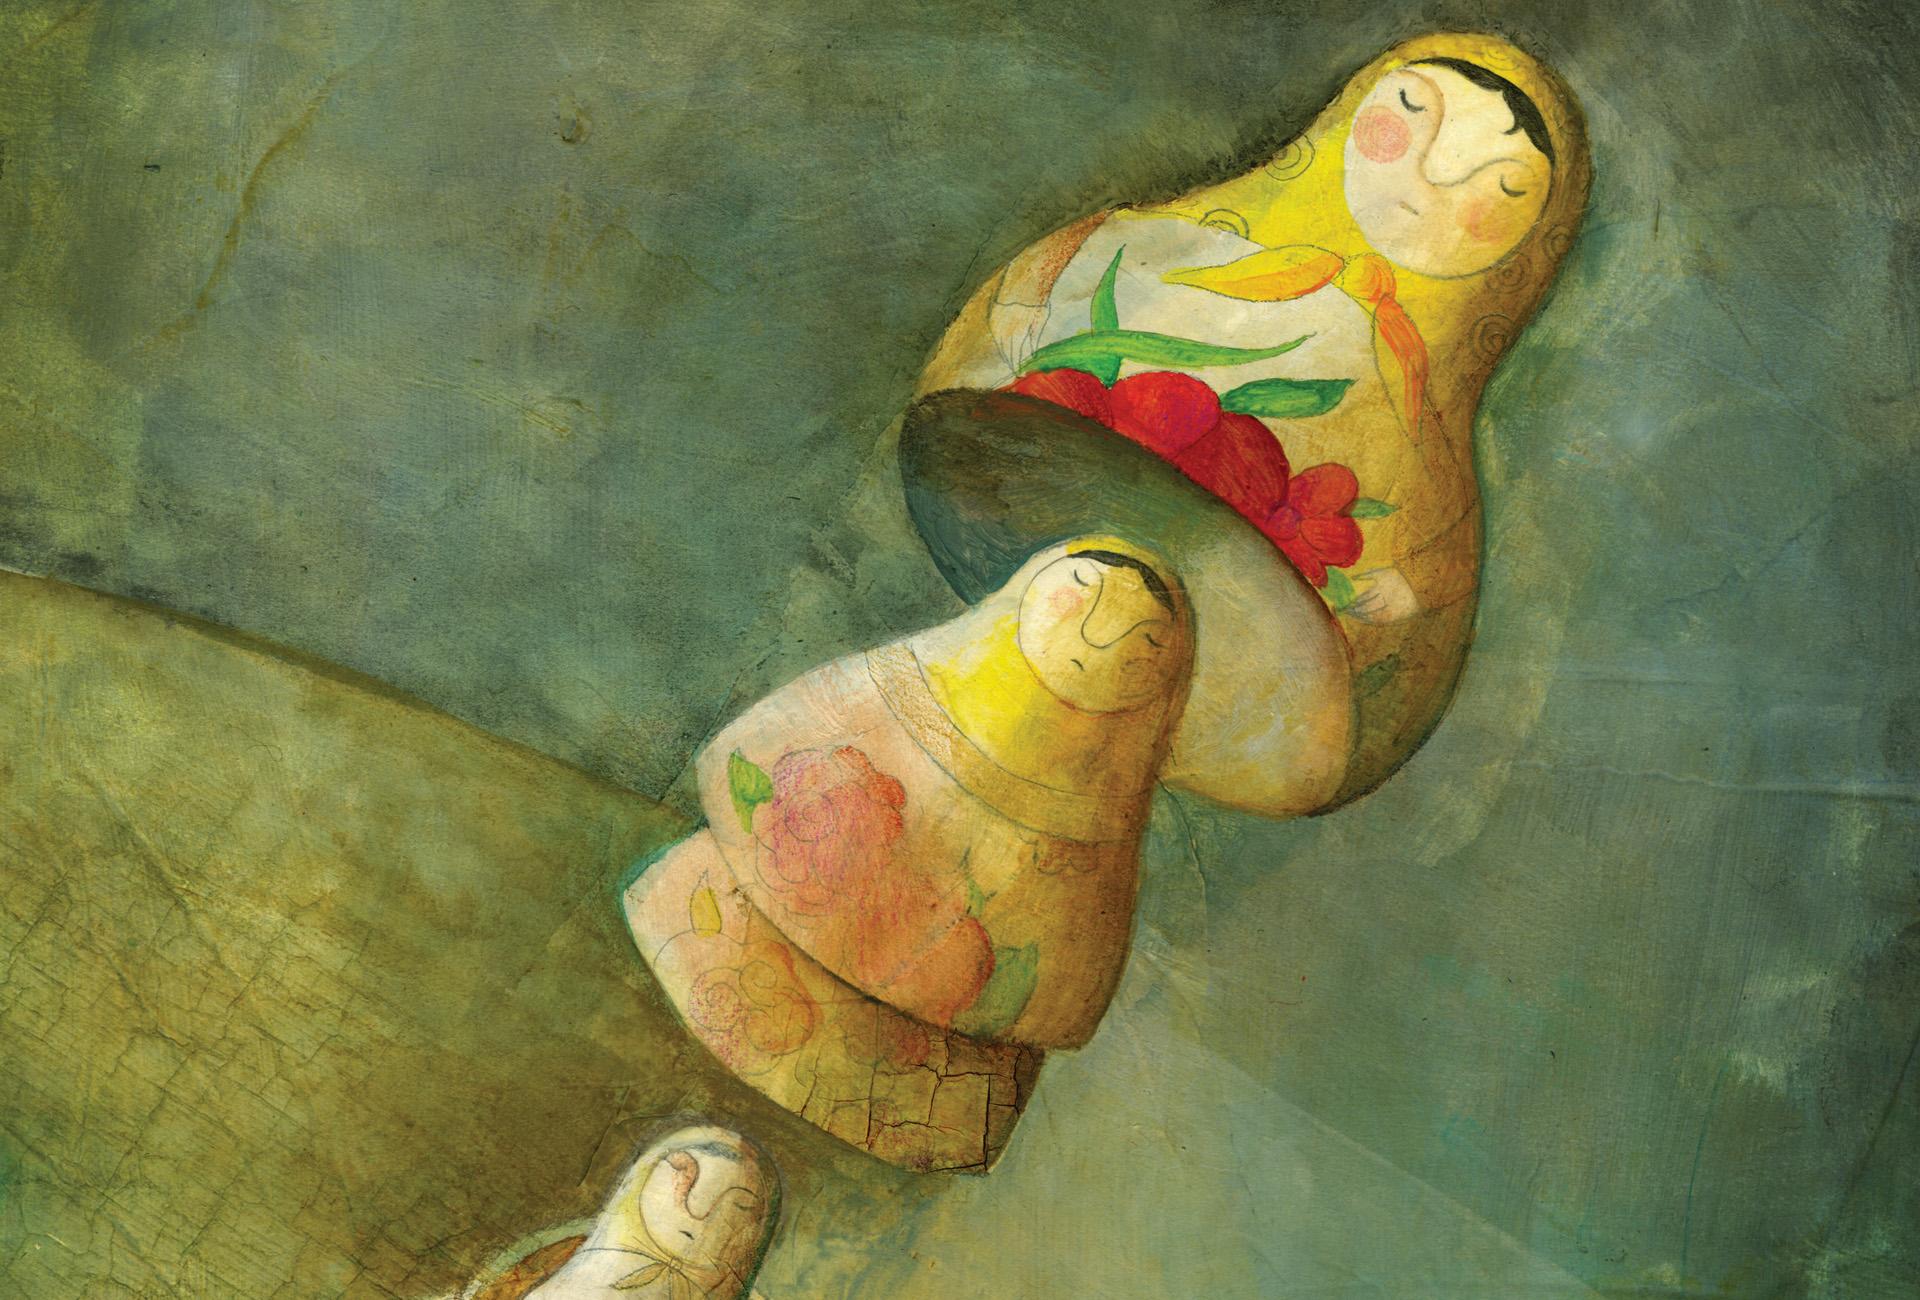 Illustration of Russian nesting dolls.